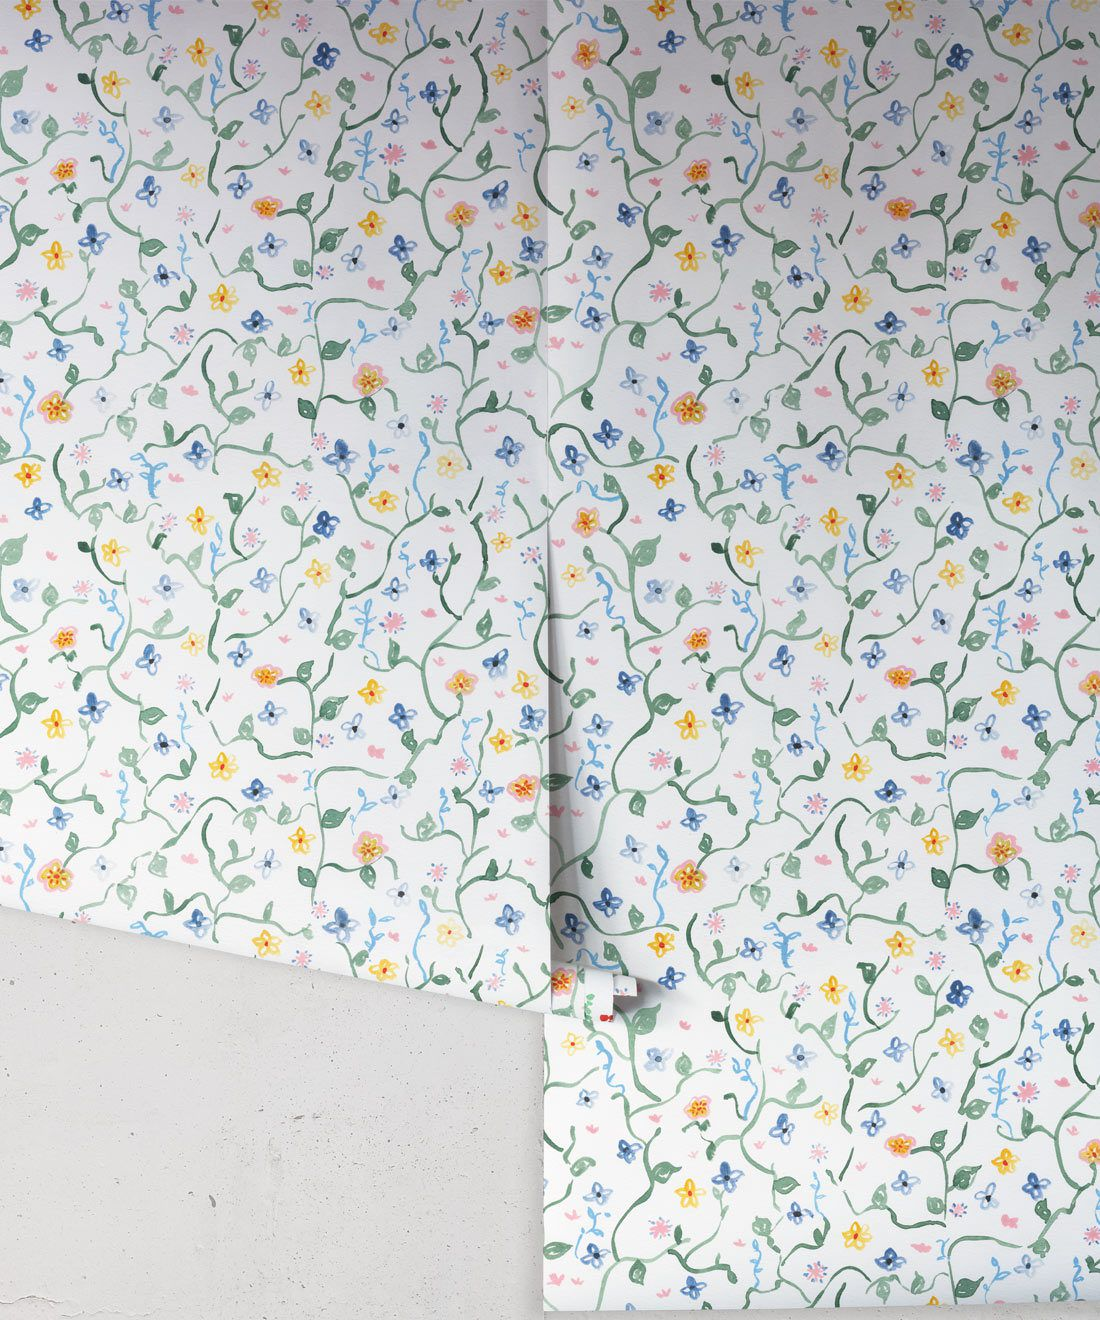 Wild Garden • Dainty Floral Wallpaper • Milton & King Europe •Georgia MacMillan • Childrens Wallpaper • Nursery Wallpaper